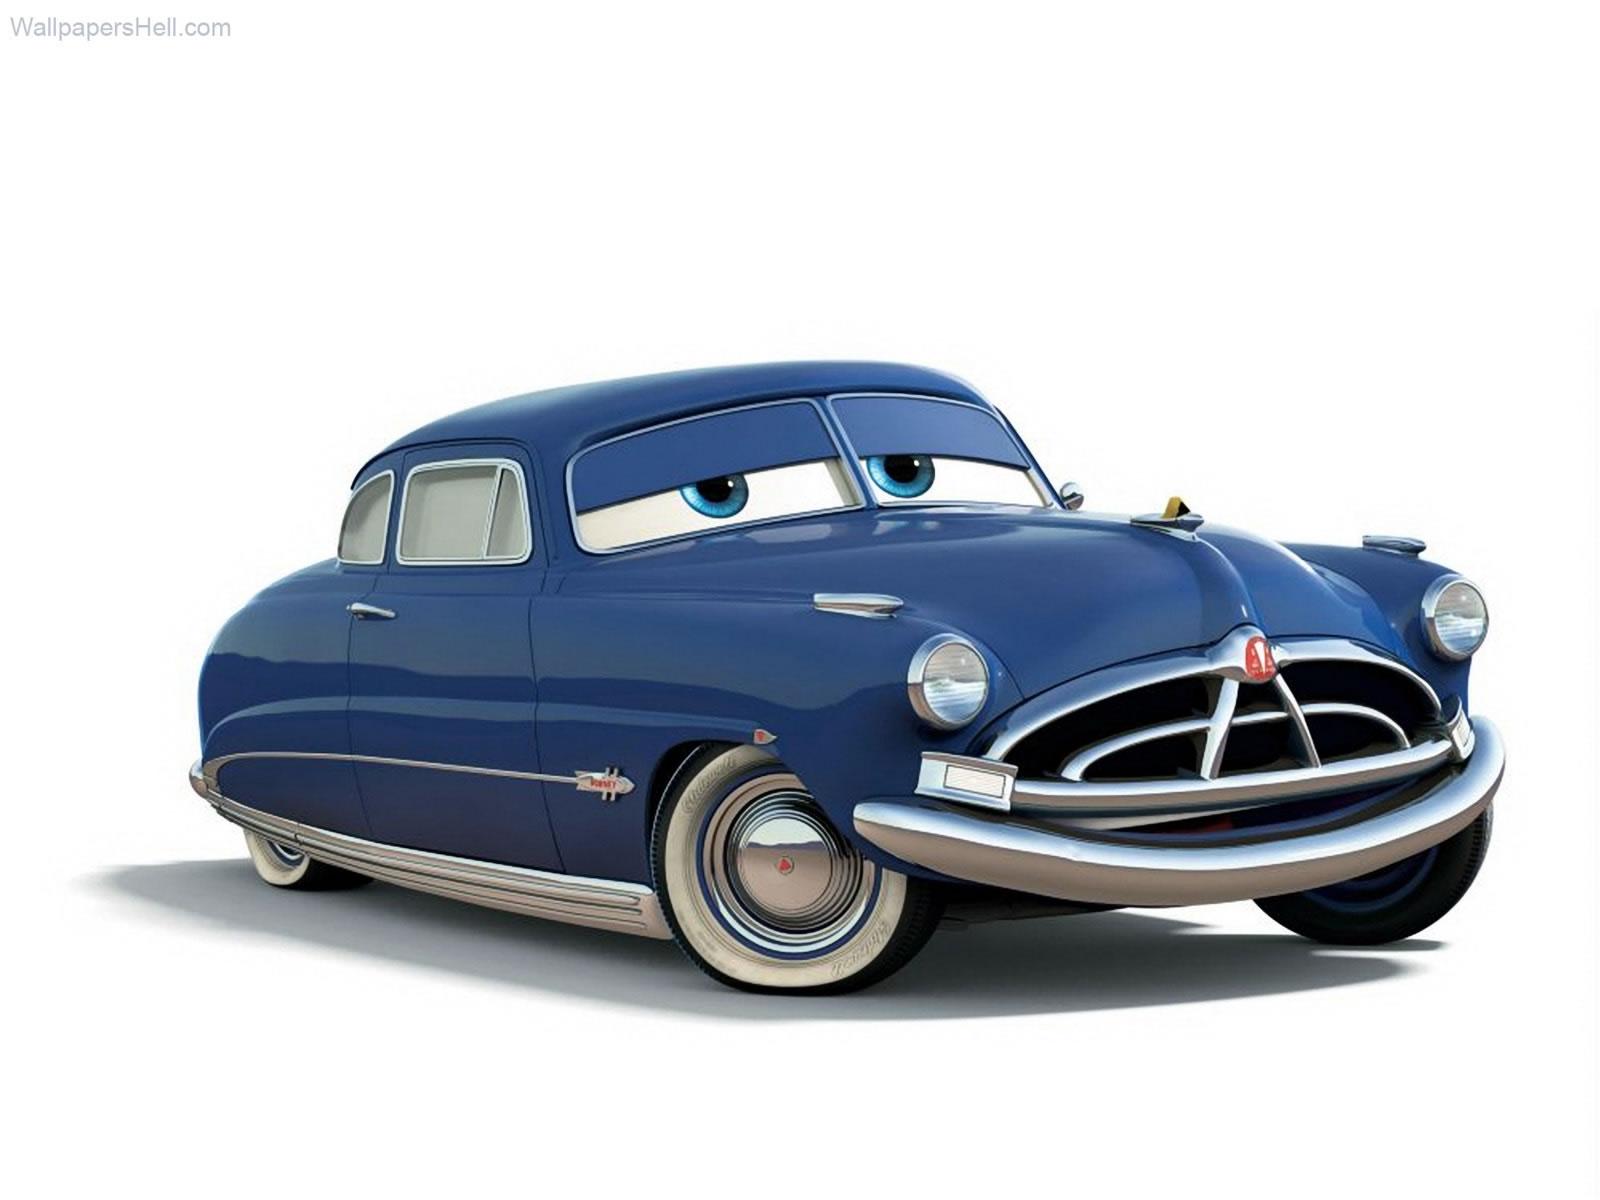 disney cars blue free wallpaper hd